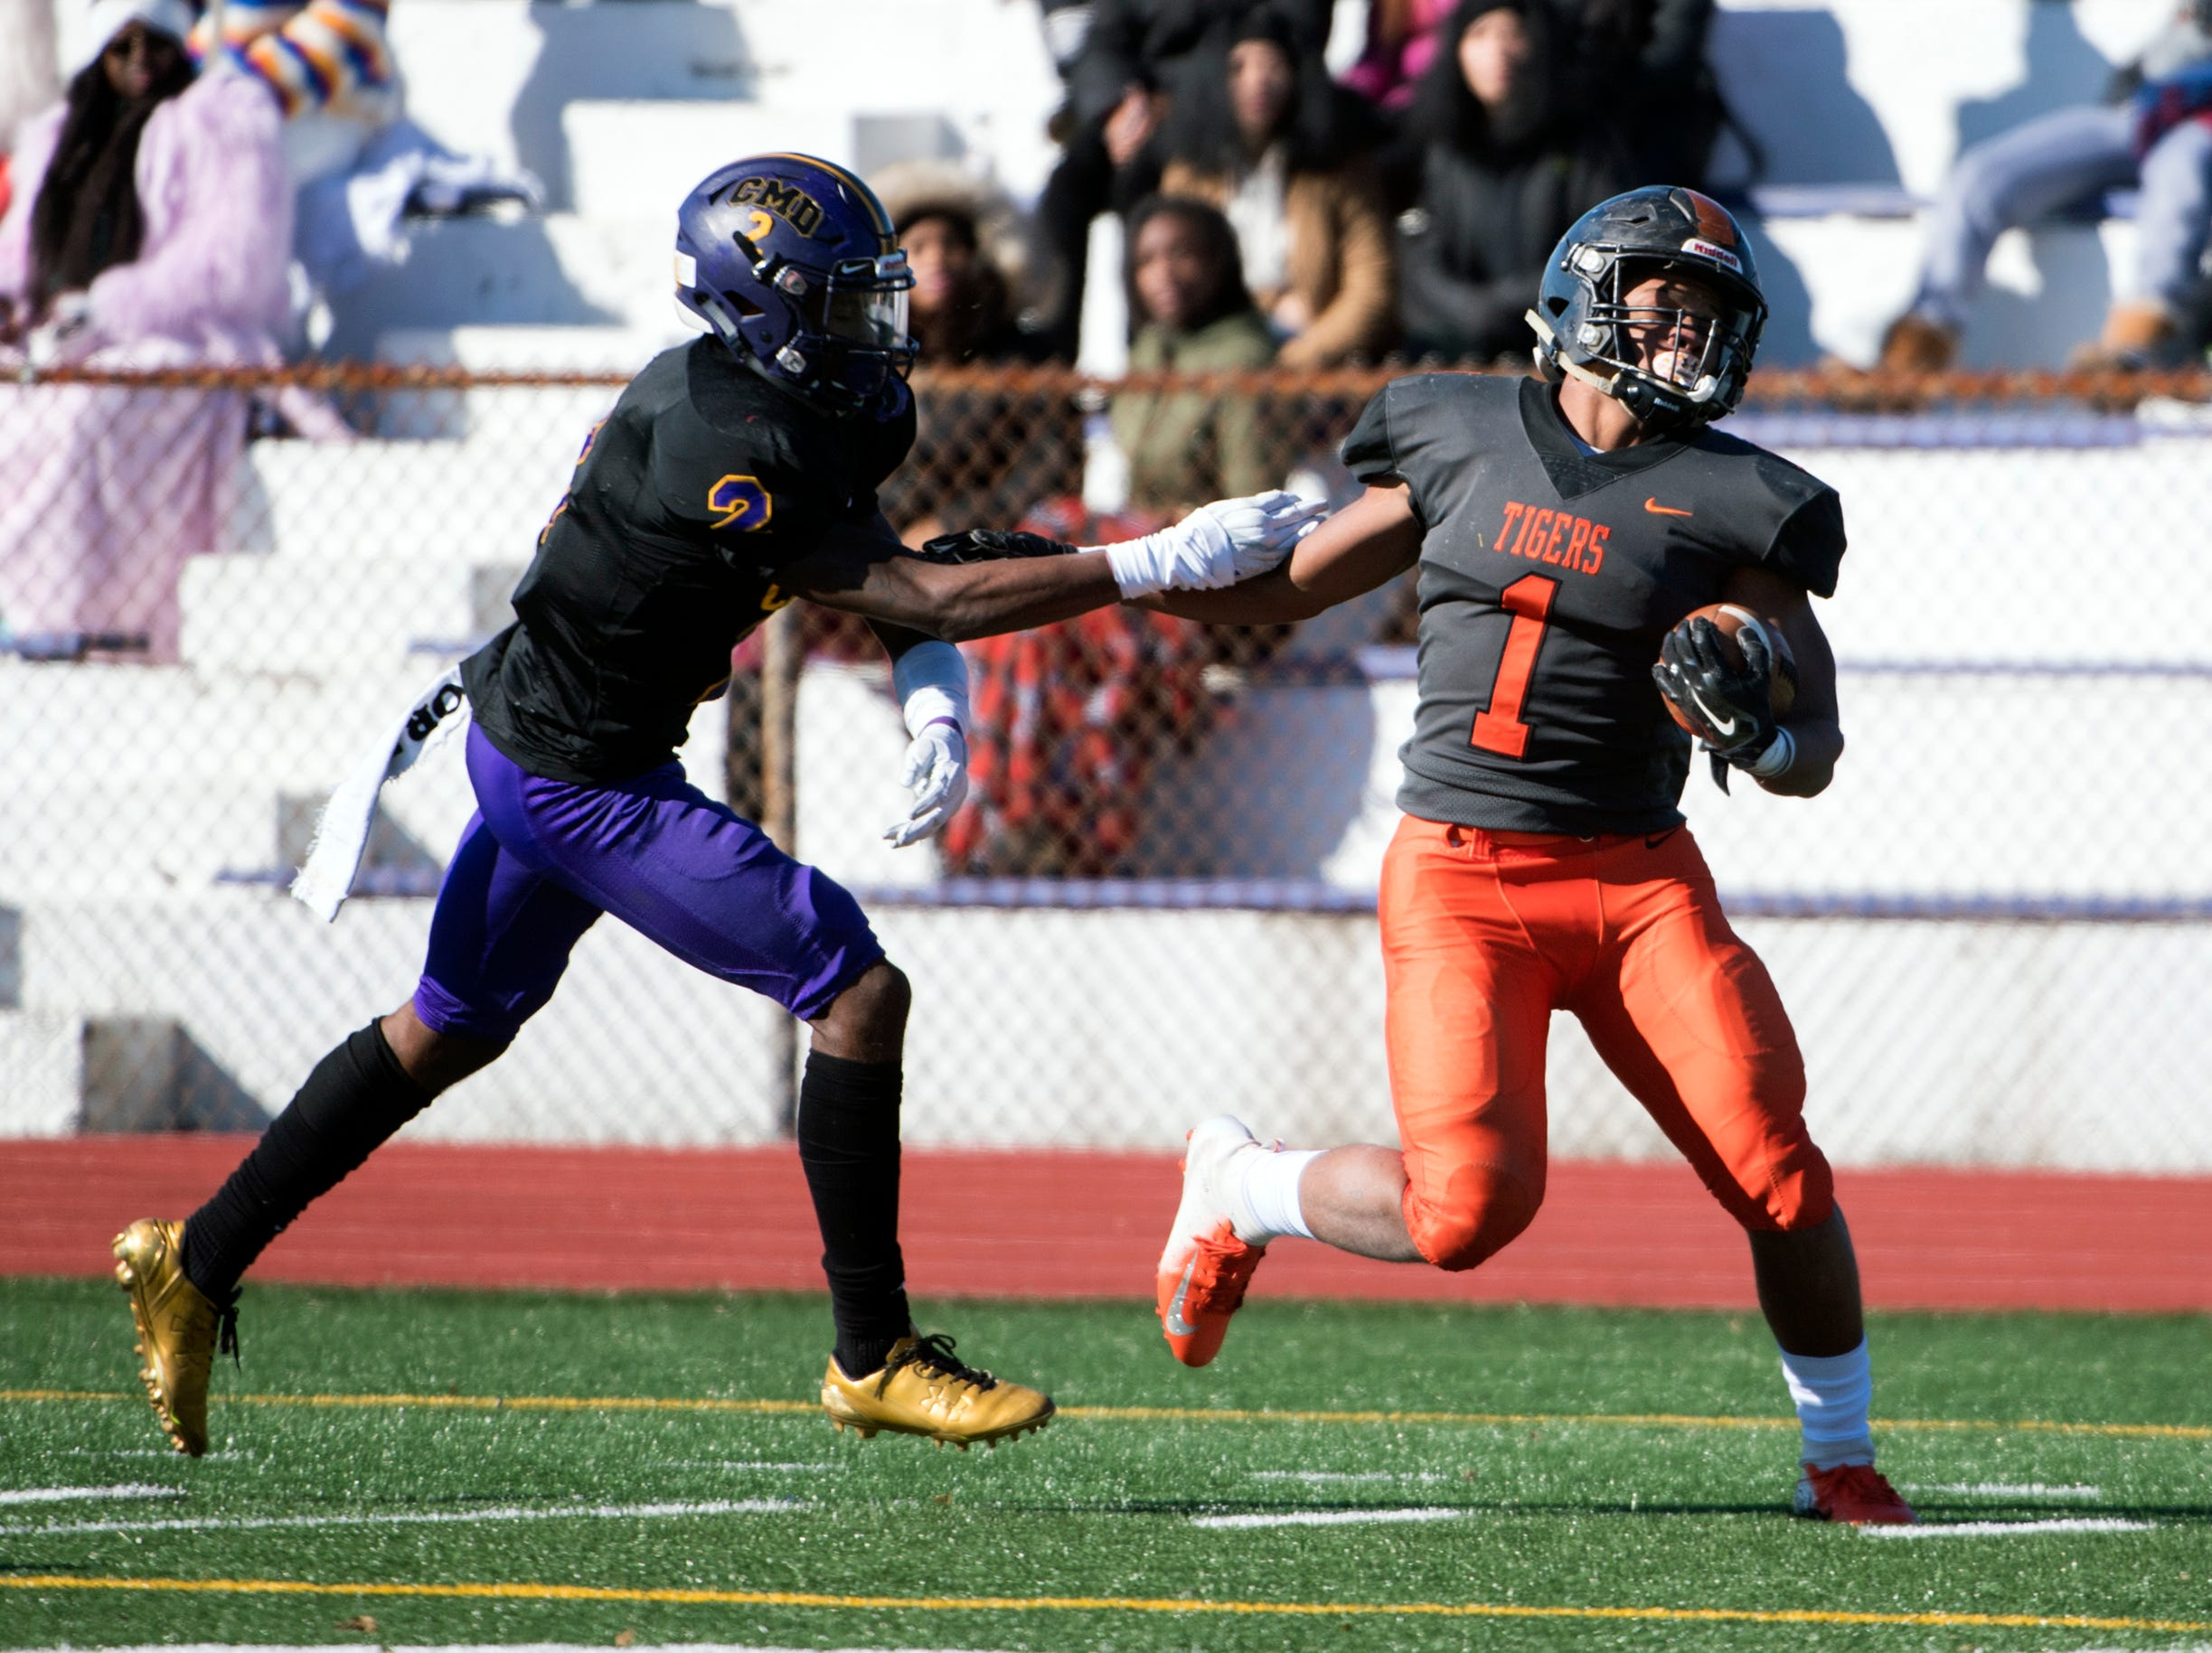 Woodrow Wilson's Muheem McCargo (1) carries the ball for a touchdown during an annual Camden-Woodrow Wilson Thanksgiving game Thursday, Nov. 22, 2018 in Camden, N.J. Camden won 39-28.